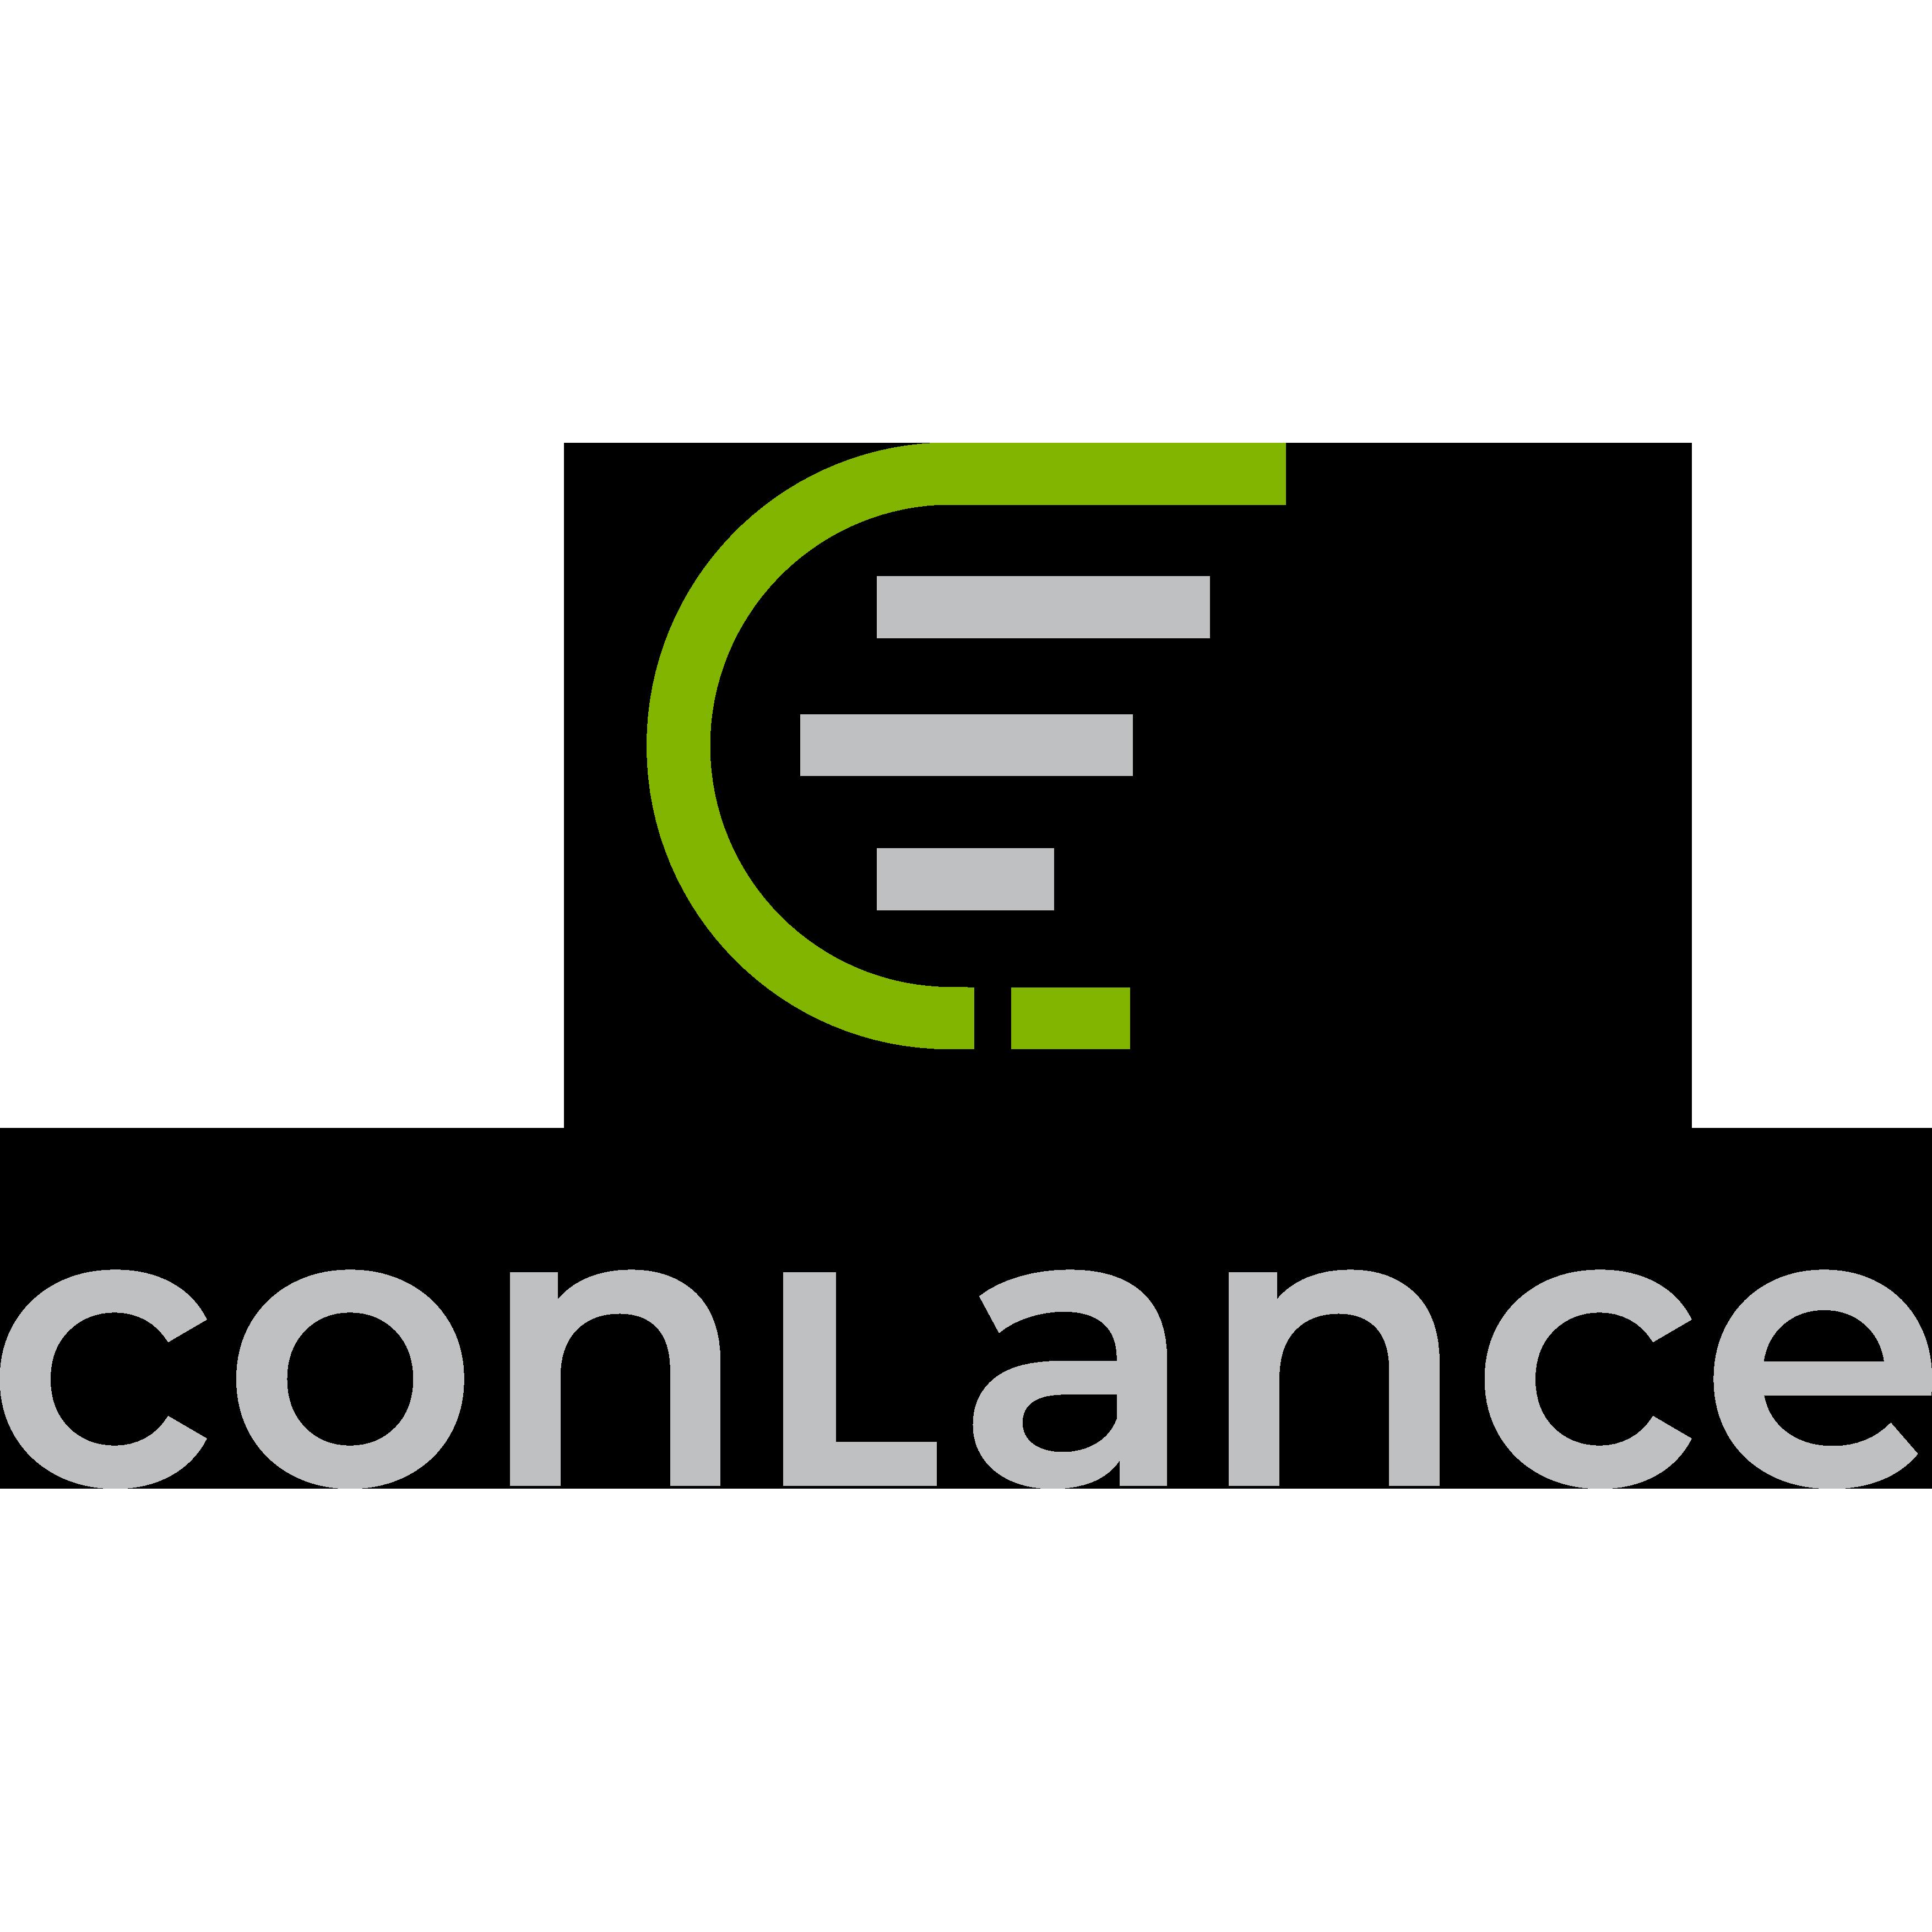 Conlance